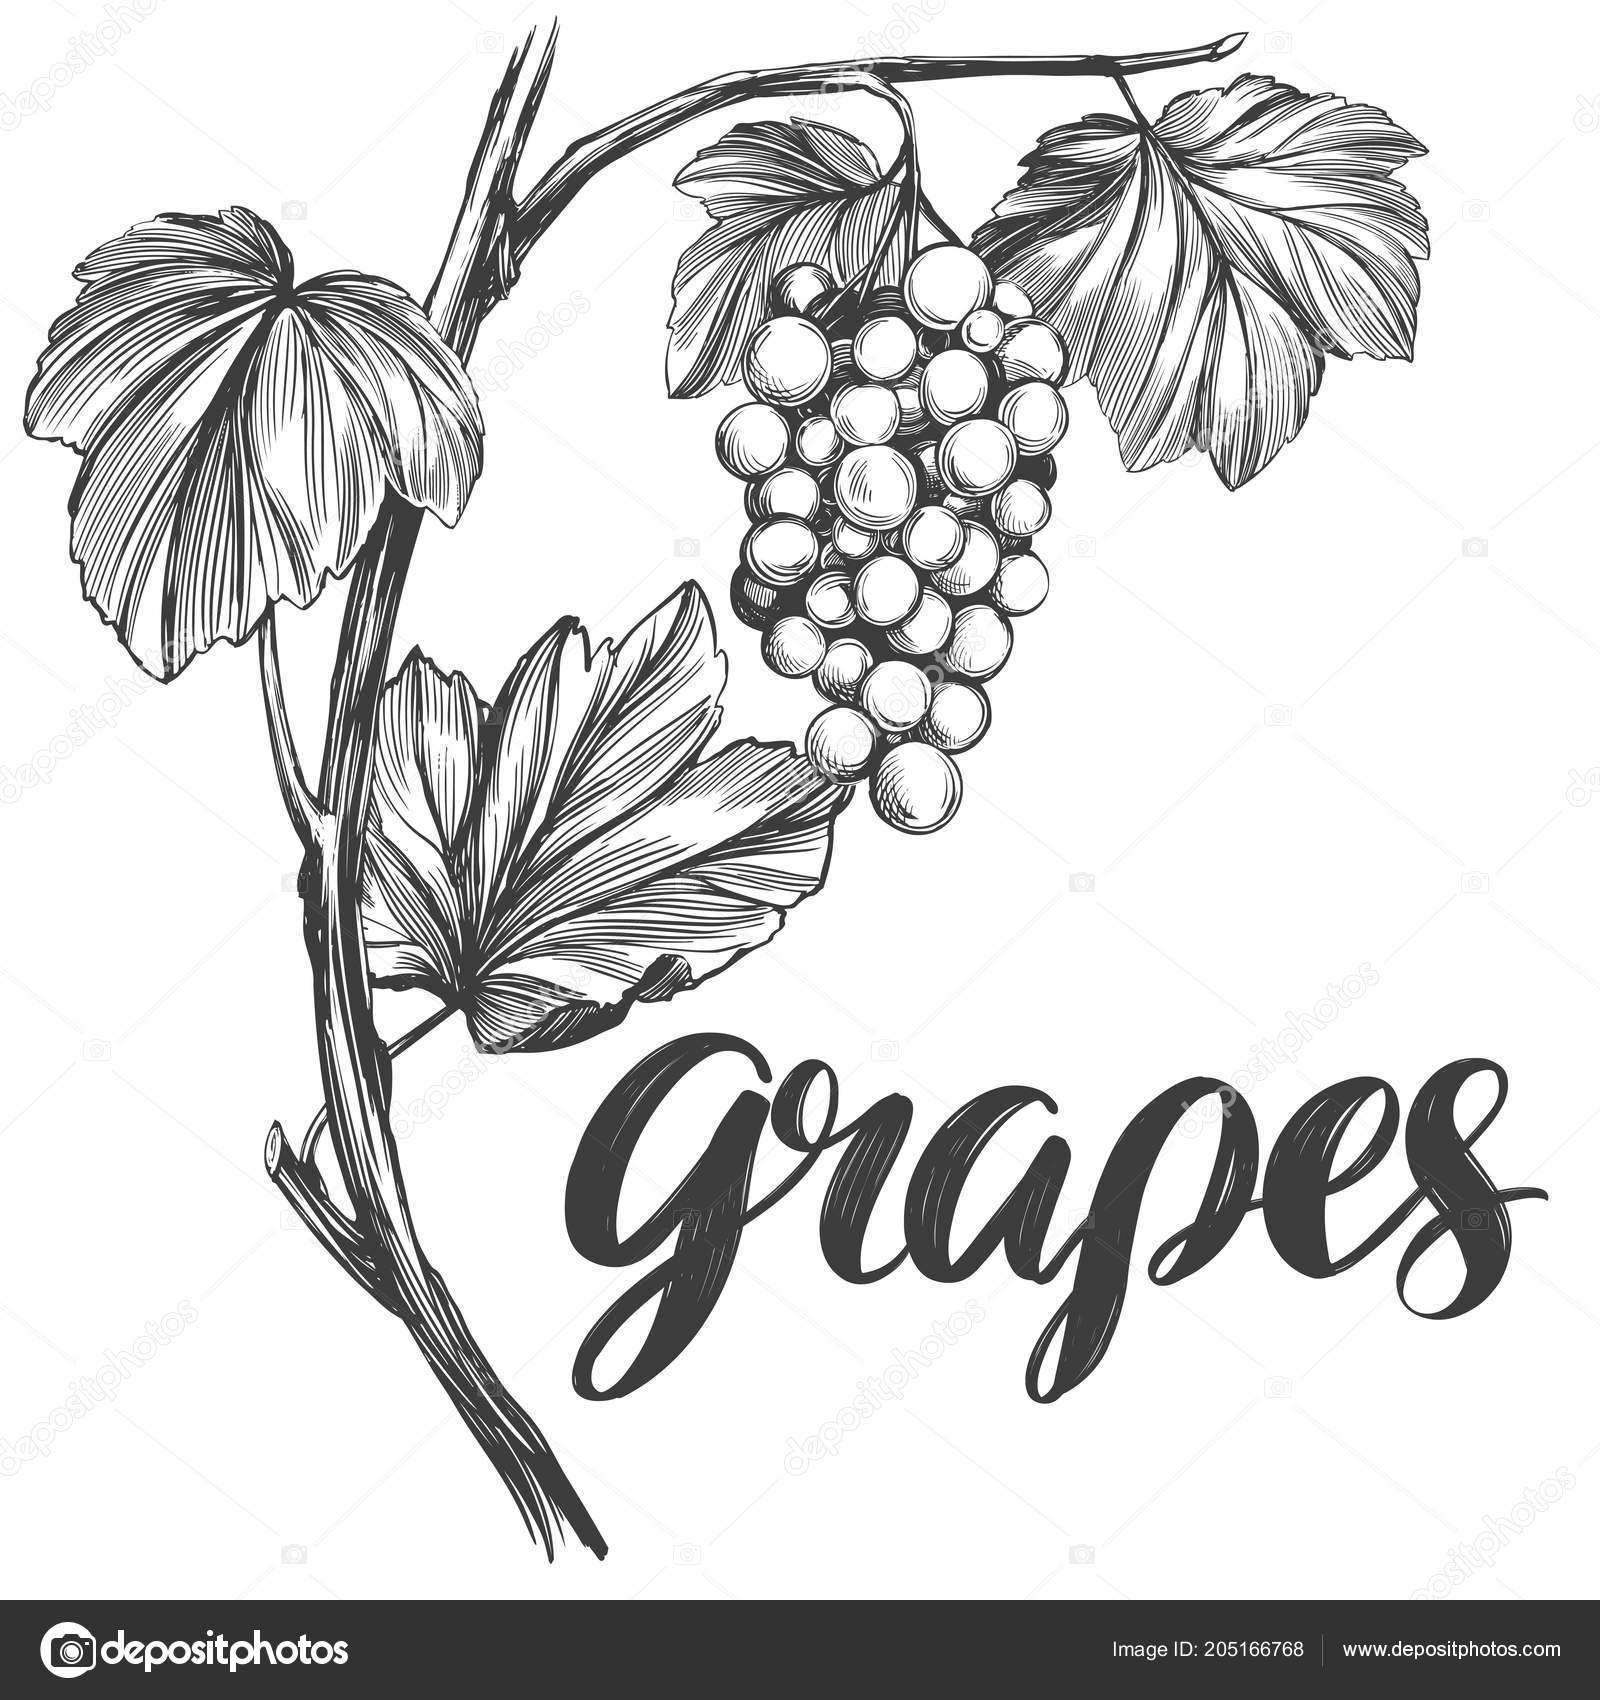 Vinna Reva Vitaceae Kaligrafie Text Rucne Kreslenou Vektorove